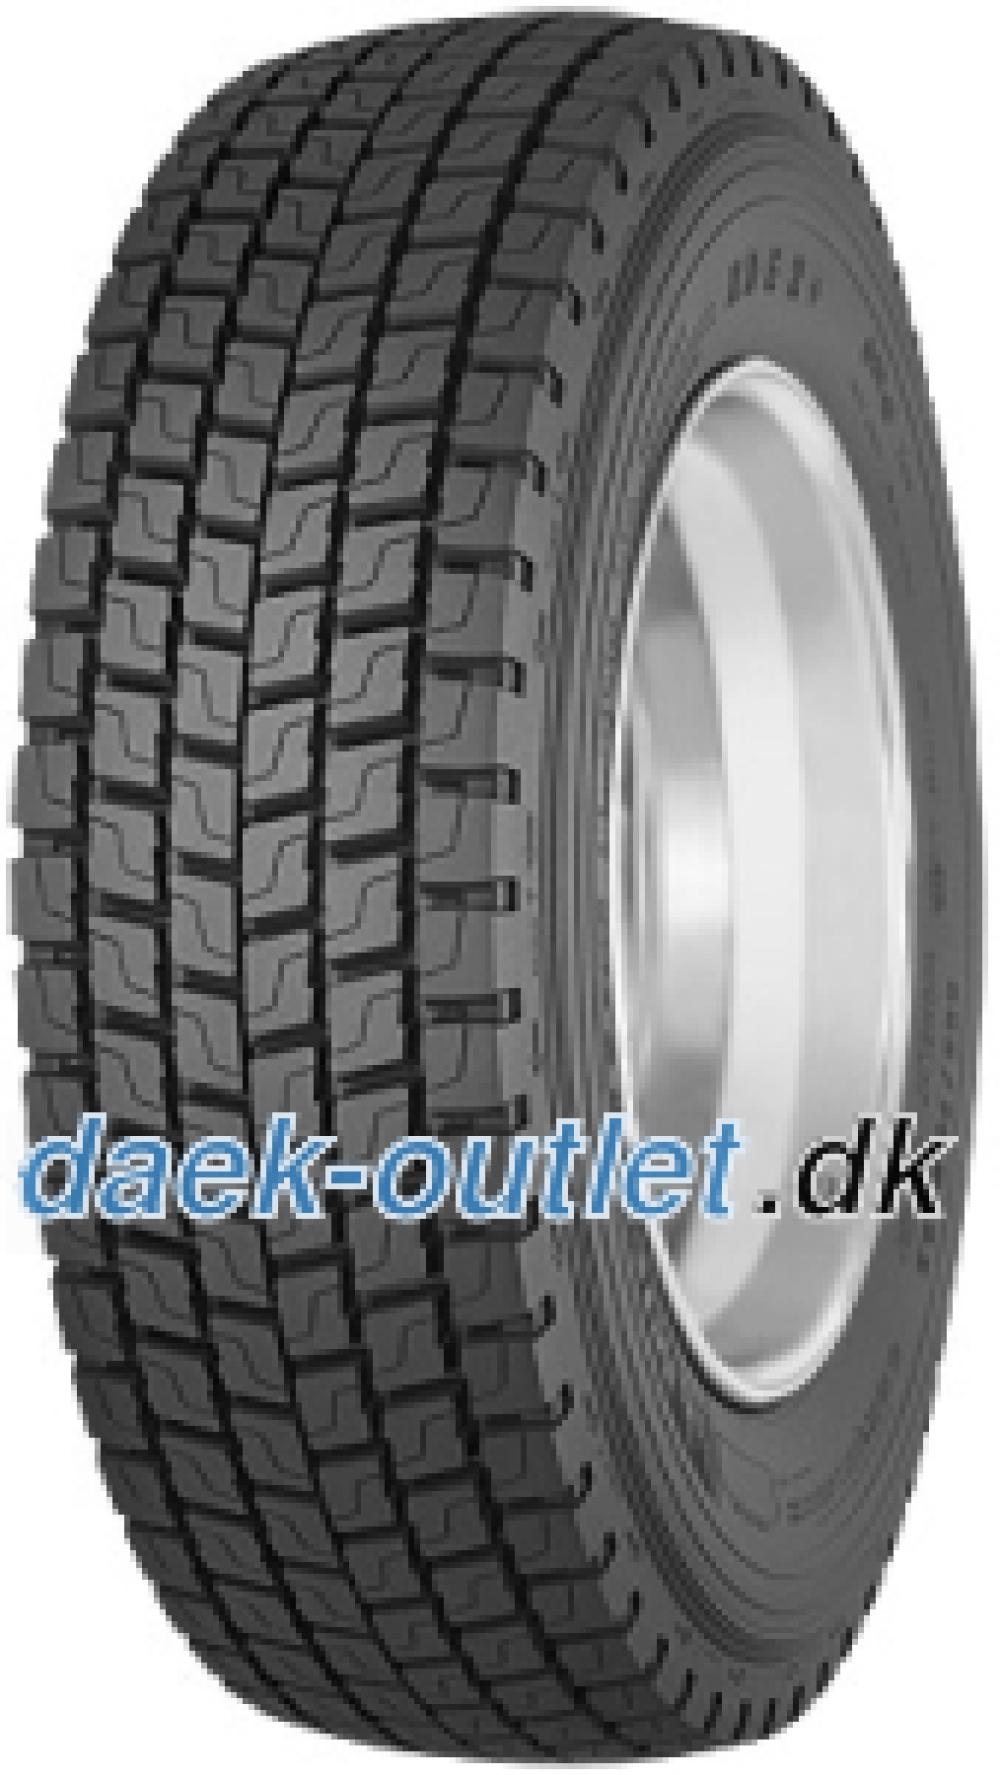 Michelin XDE 2+ ( 315/80 R22.5 156/150L , Dobbelt mærkning 154/150M )